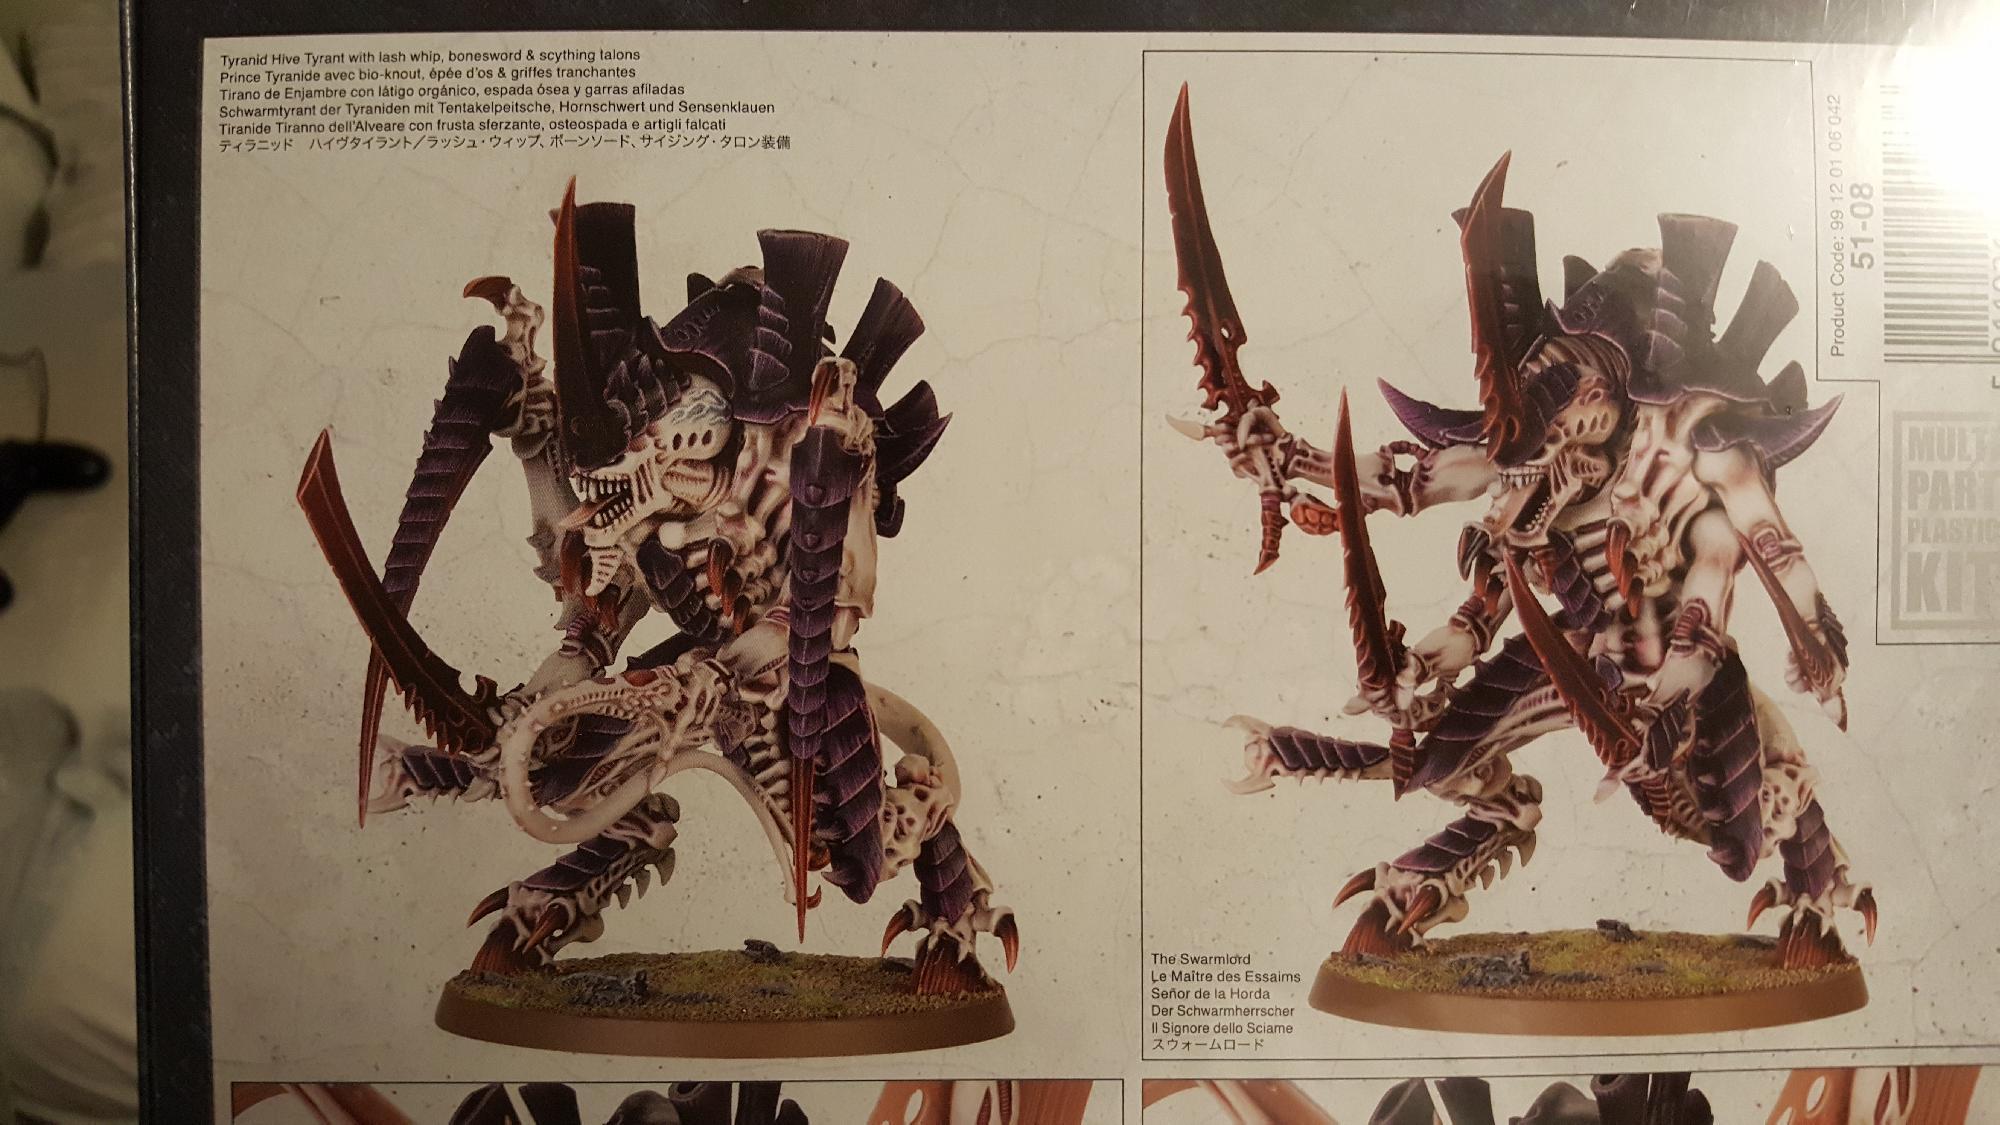 Warhammer 40K Tyranids Hive Tyrant Swarmlord